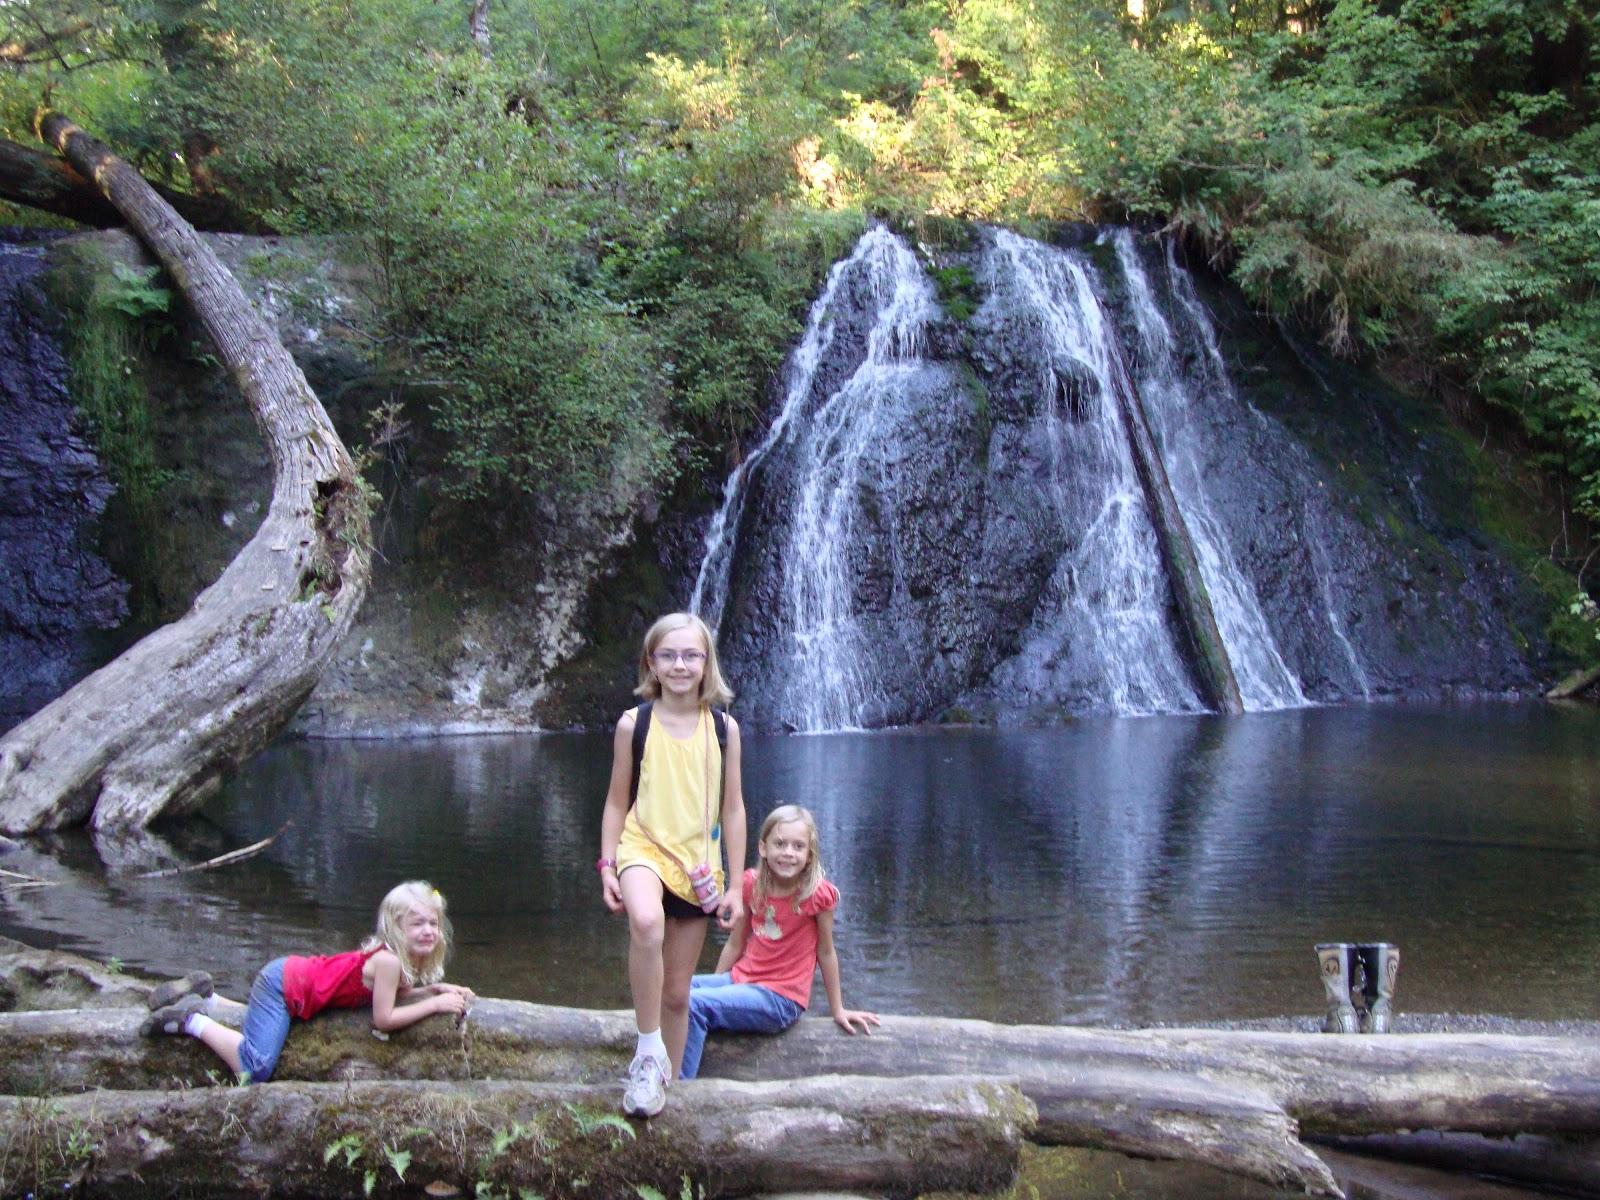 Haigh happenings cherry creek falls for Cherrycreek